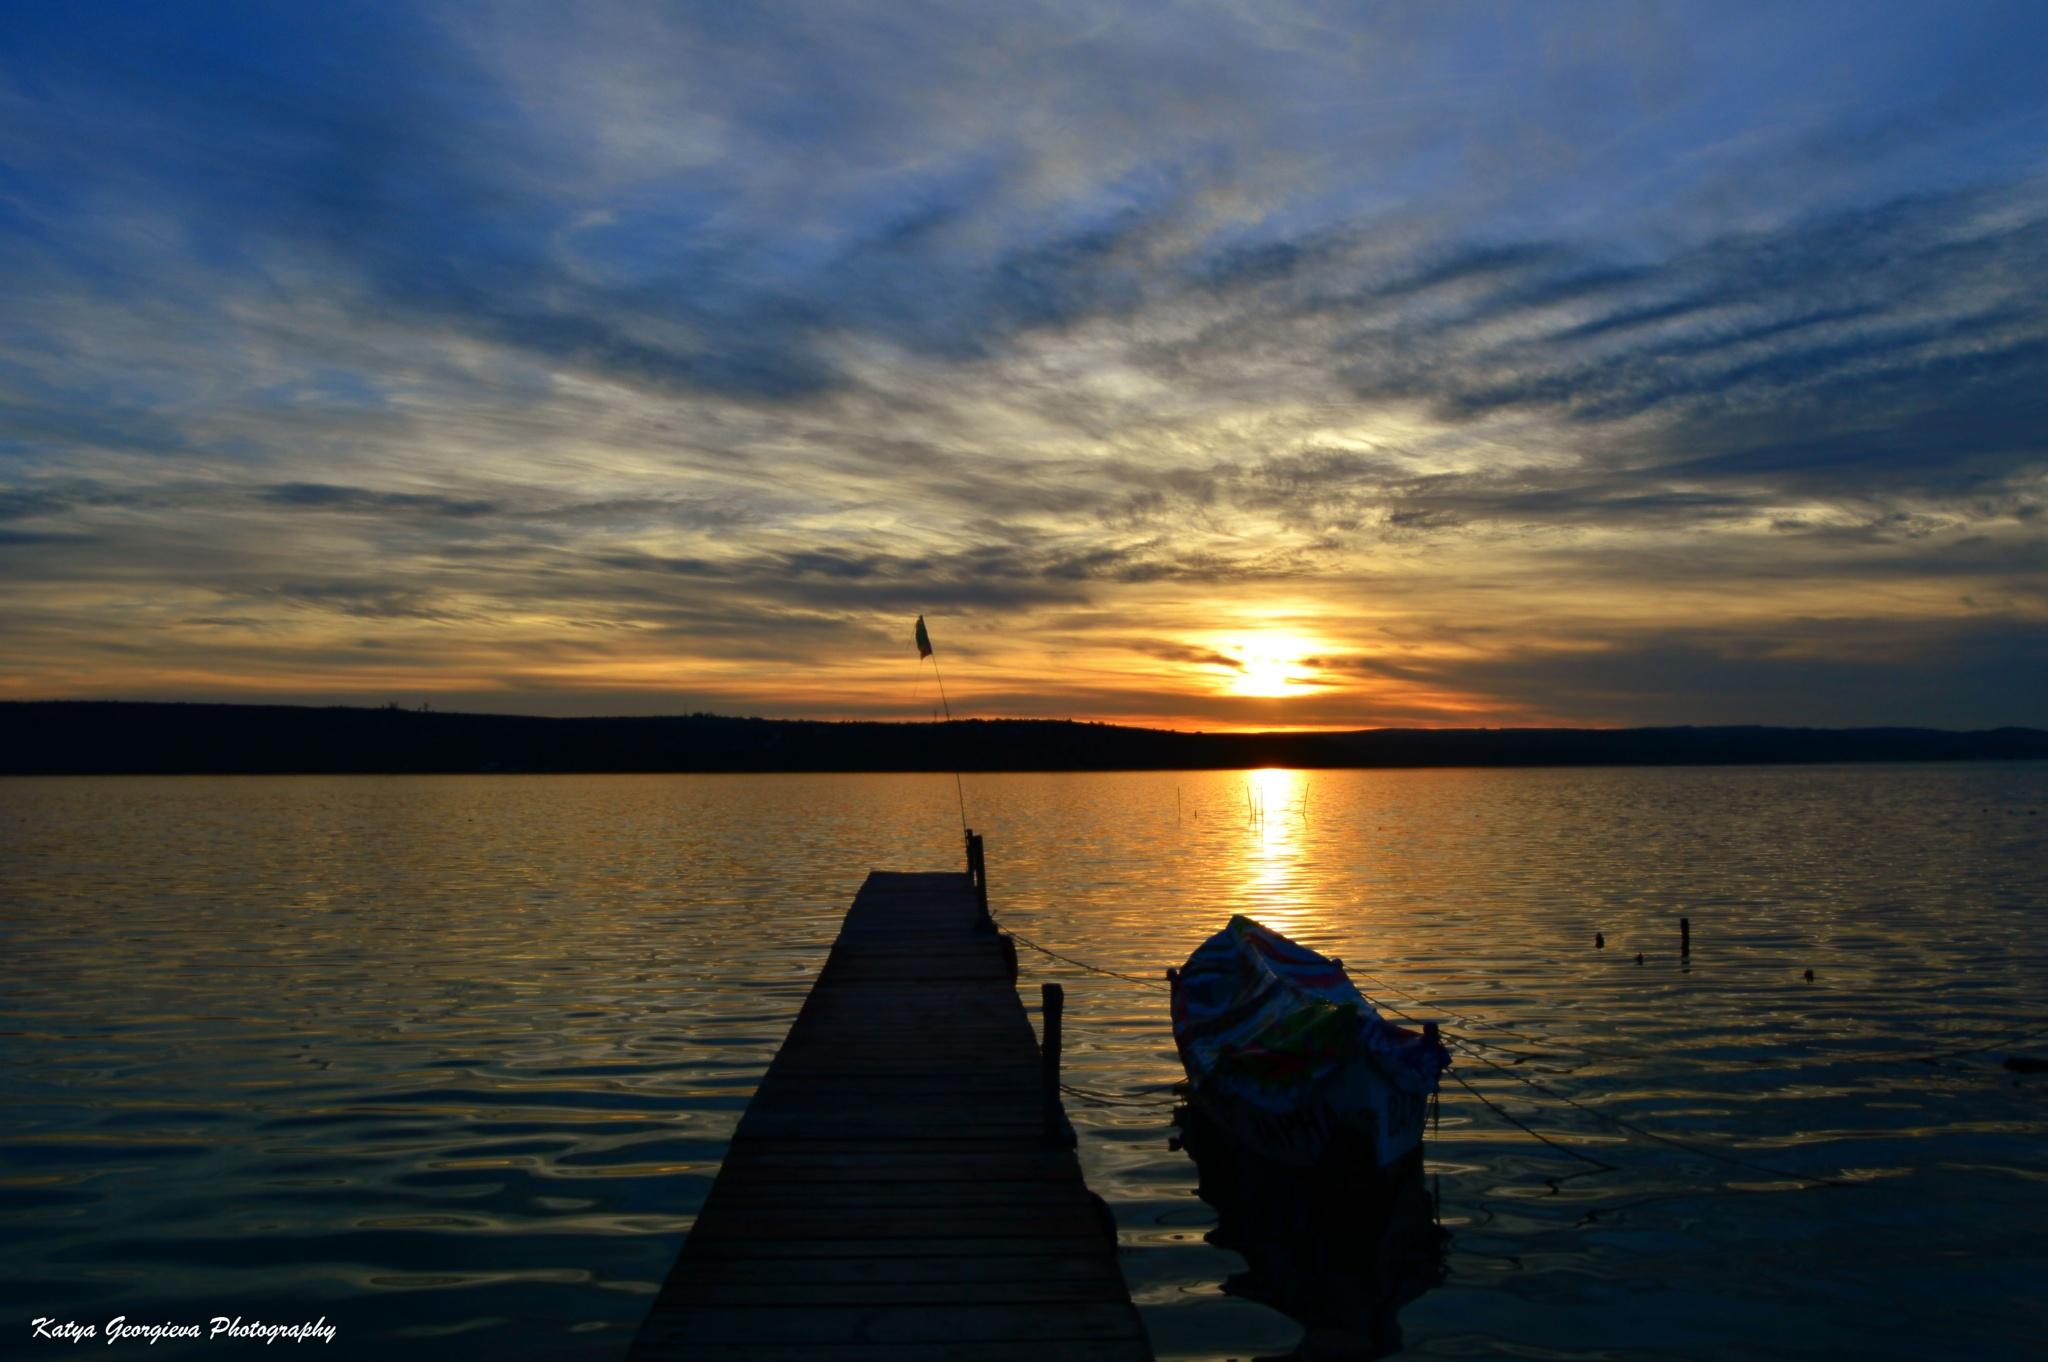 The Sunset by Katya Georgieva Photography